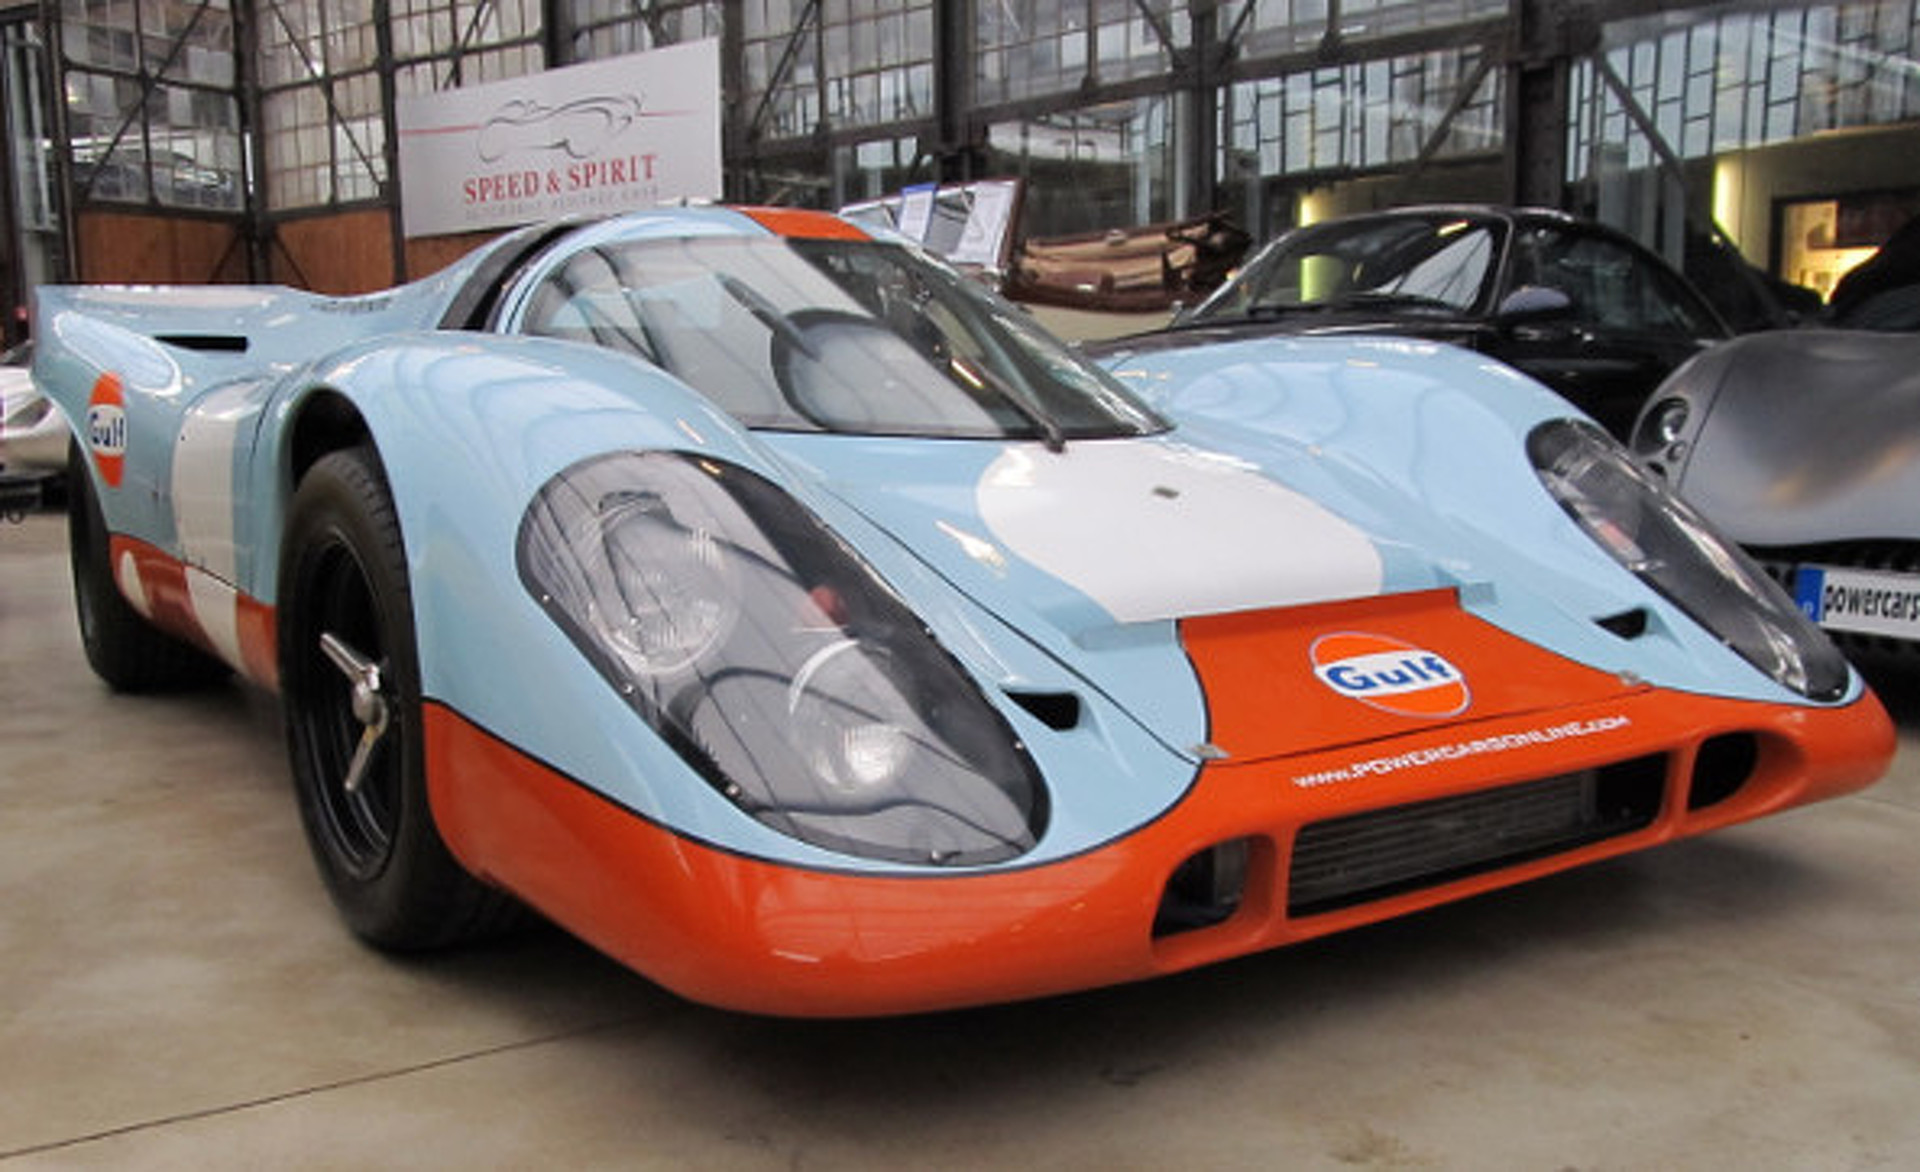 Crashing Someone Else's Porsche 917 is an Auto Journalists Worst Nightmare